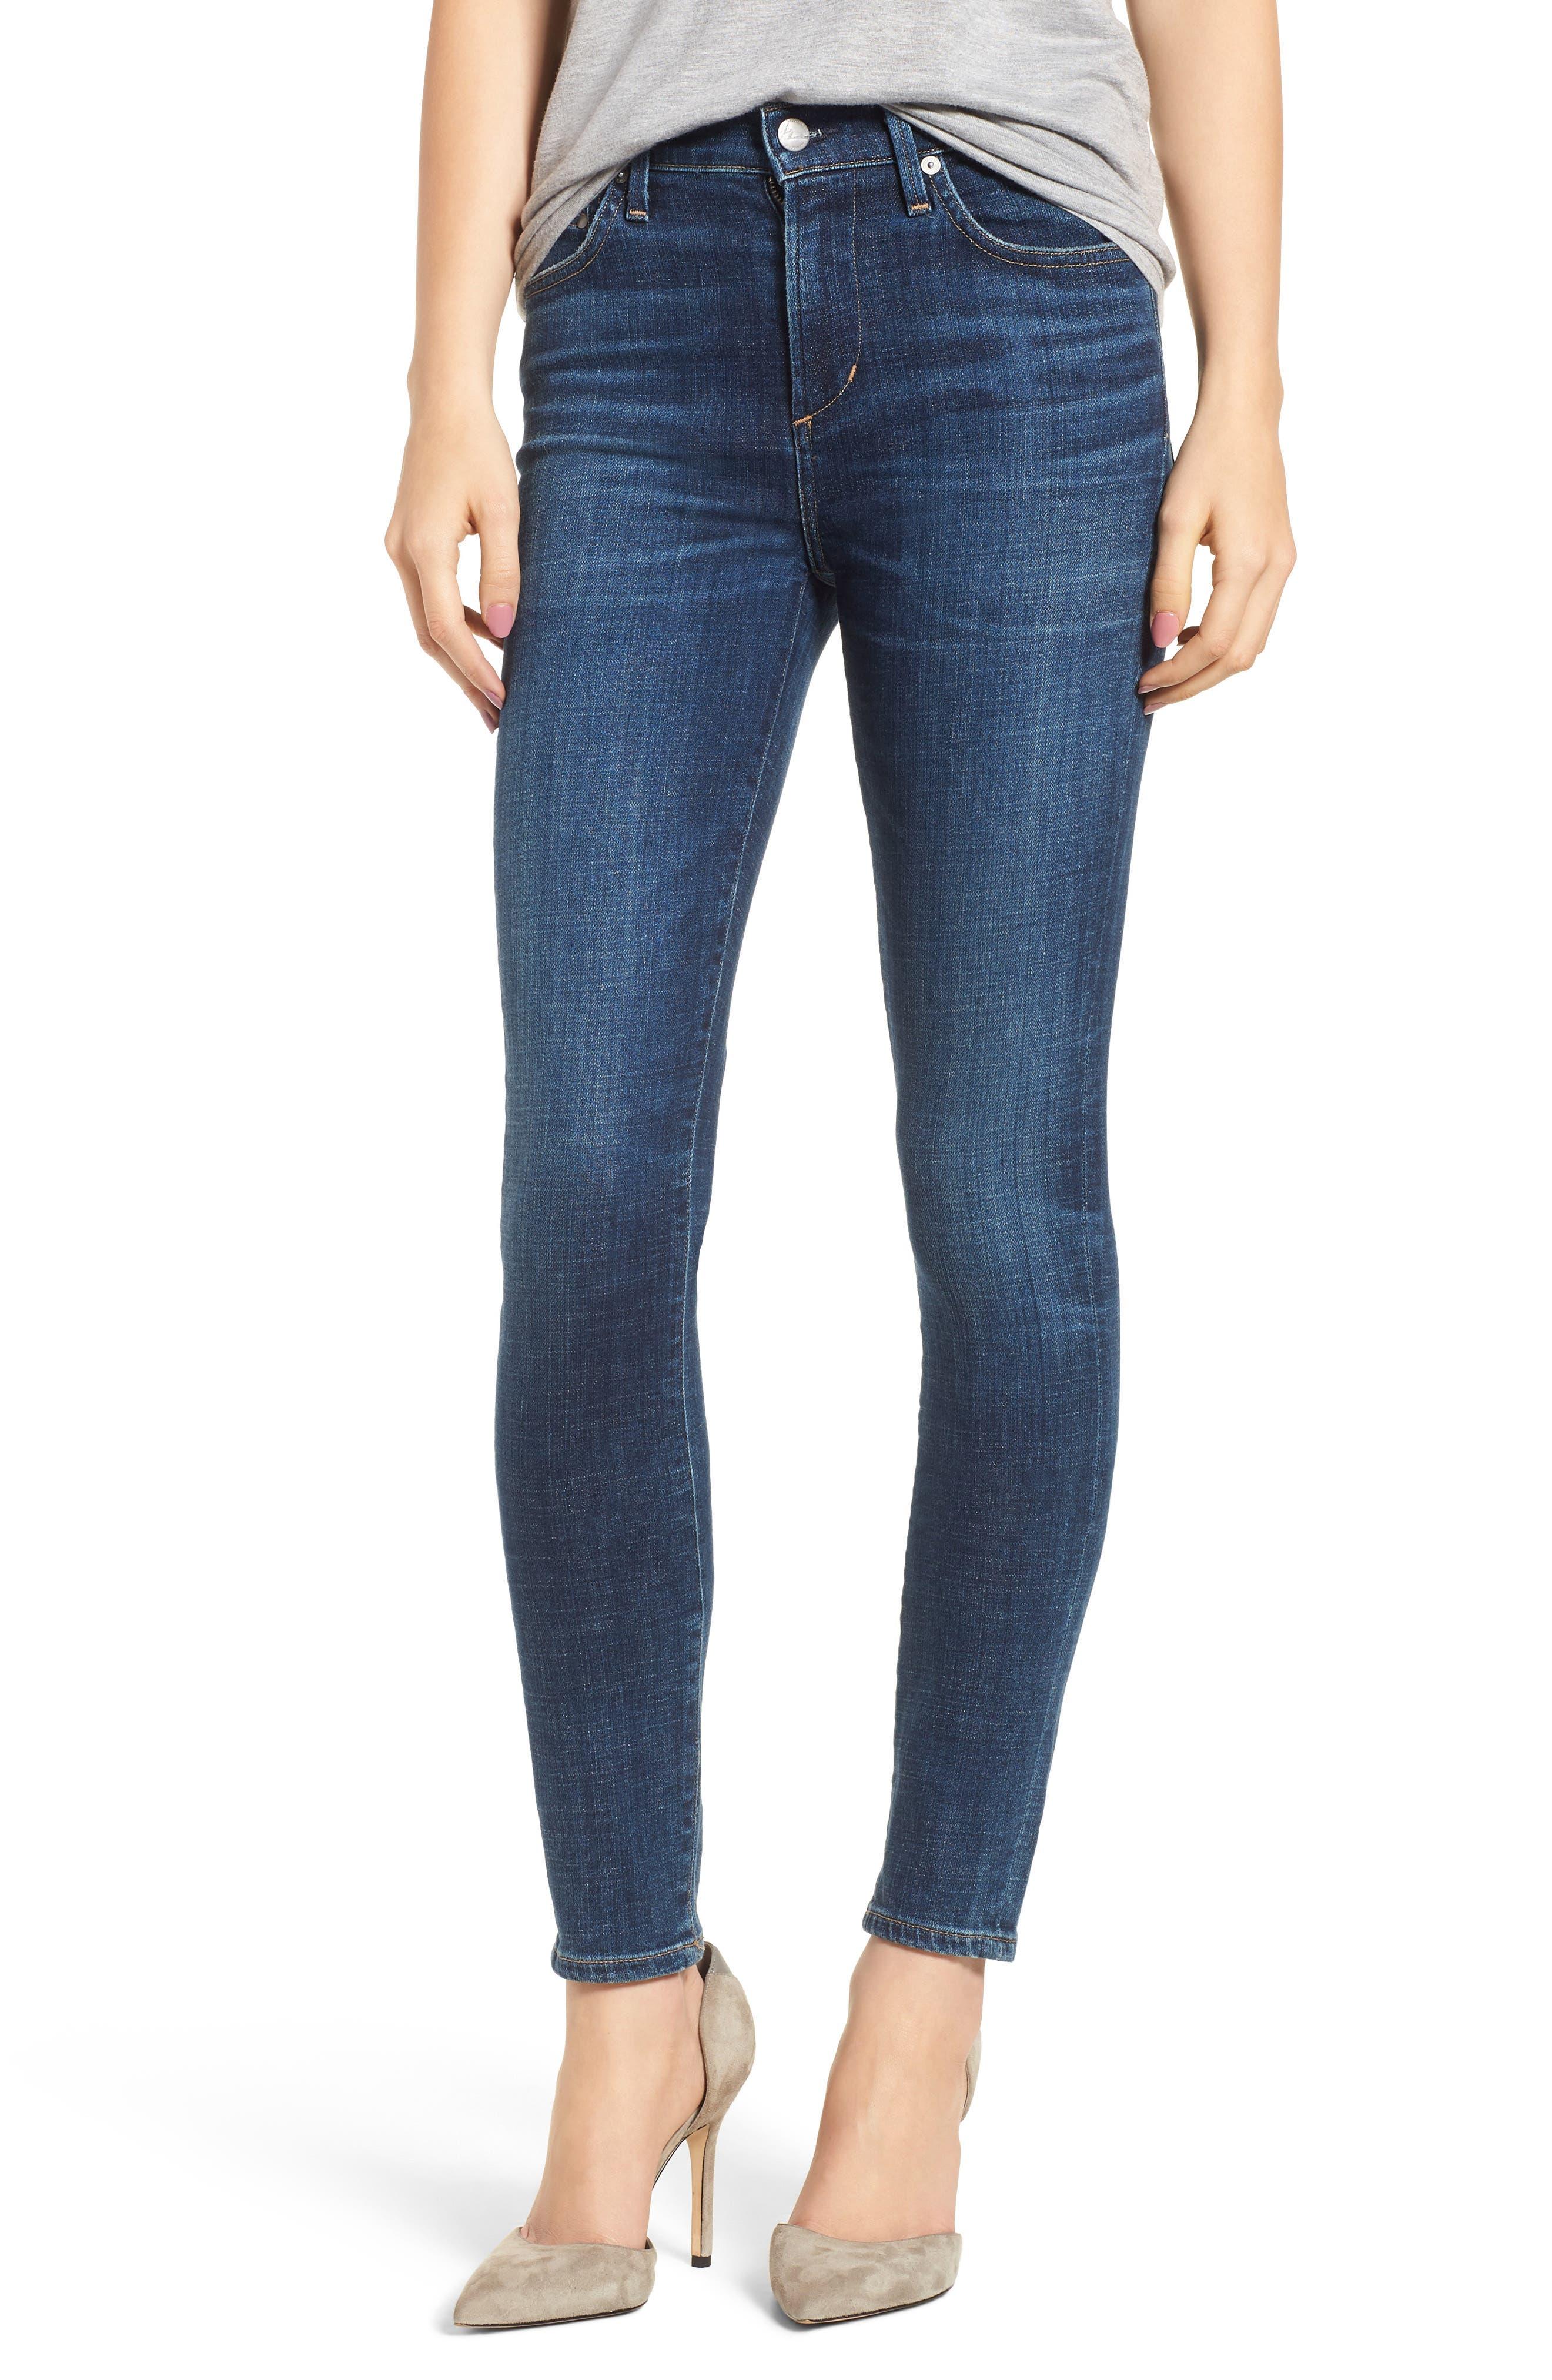 Rocket High Waist Skinny Jeans,                             Main thumbnail 1, color,                             428